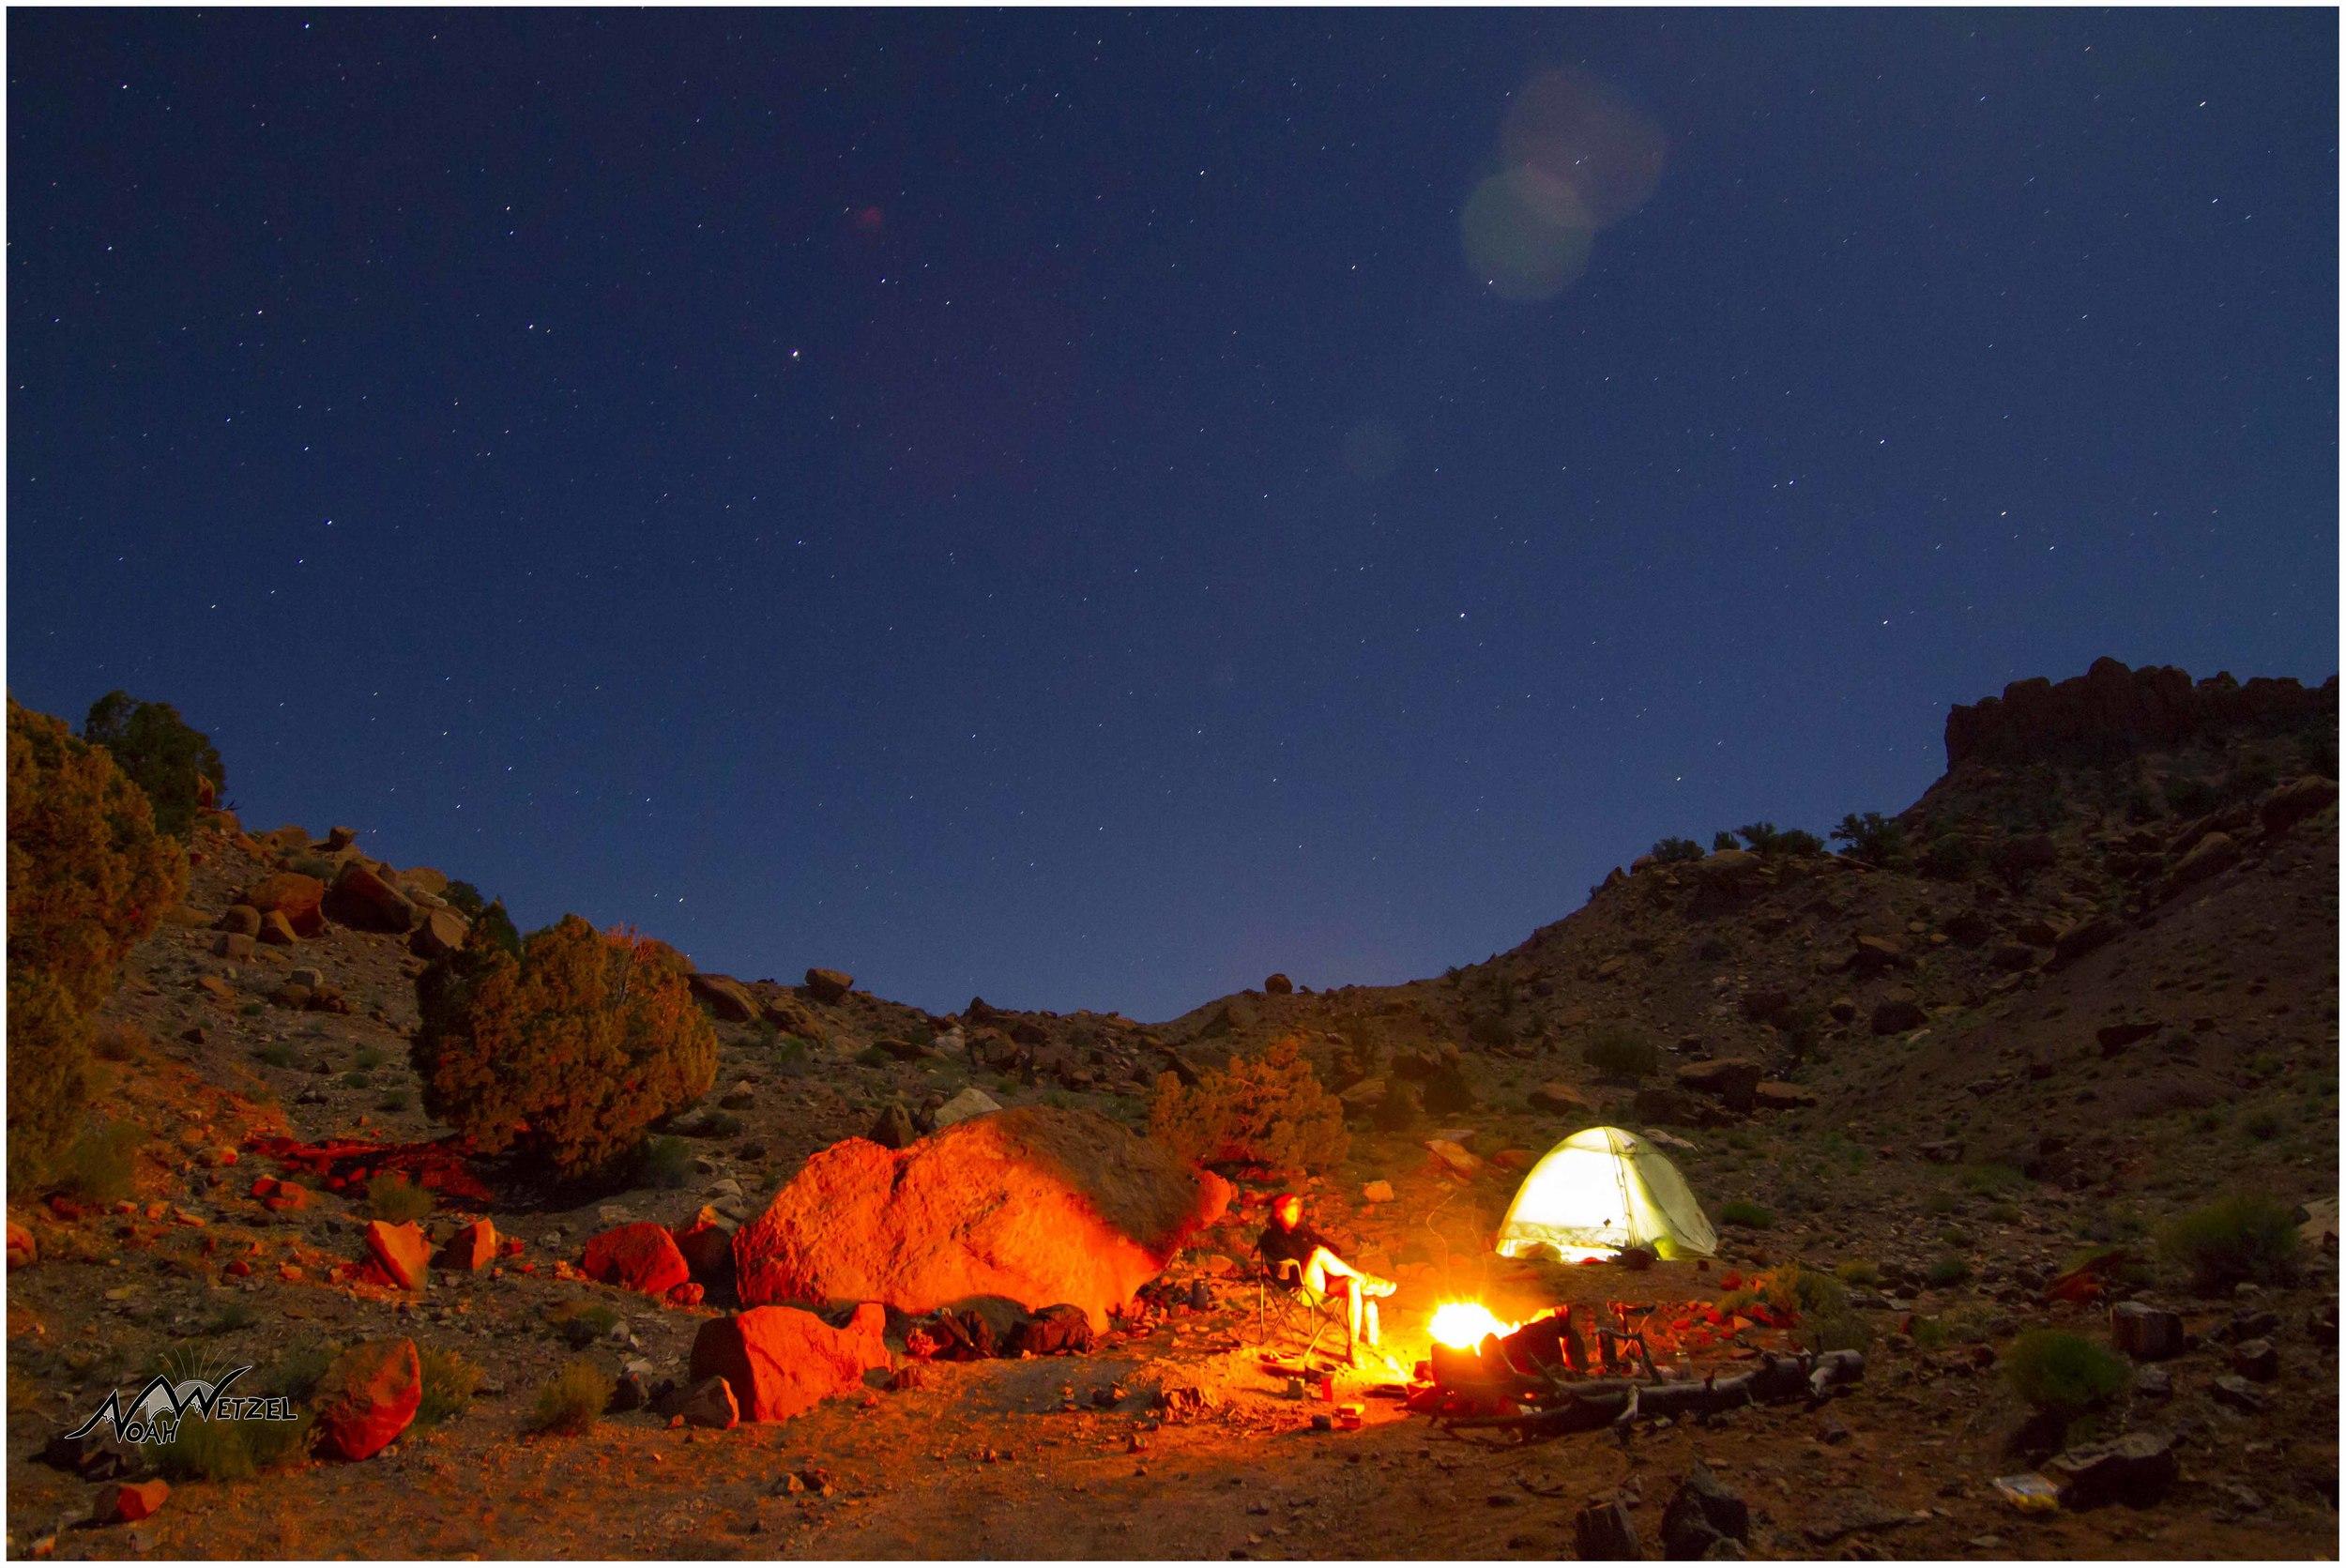 Our campsite off Wolverine Rd. Escalante, Utah